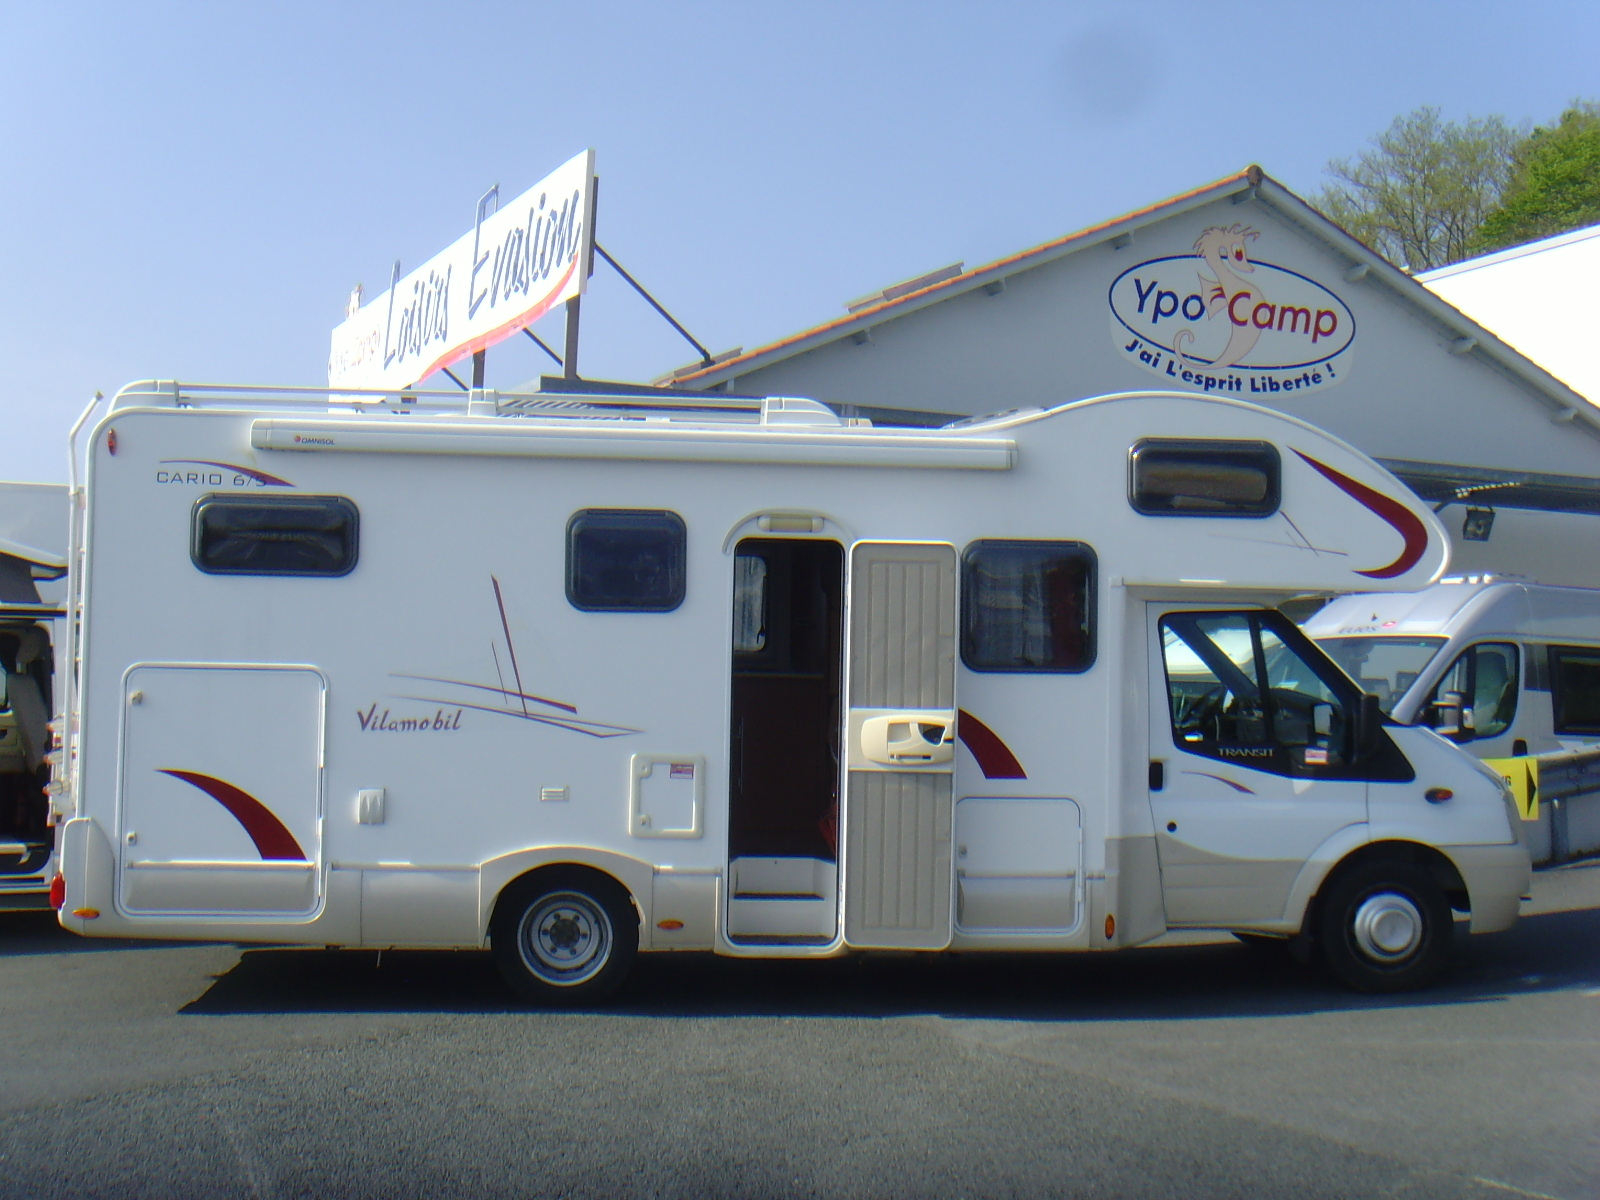 vilamobil cario 6 5 occasion de 2008 fiat camping car en vente irun espagne esp. Black Bedroom Furniture Sets. Home Design Ideas